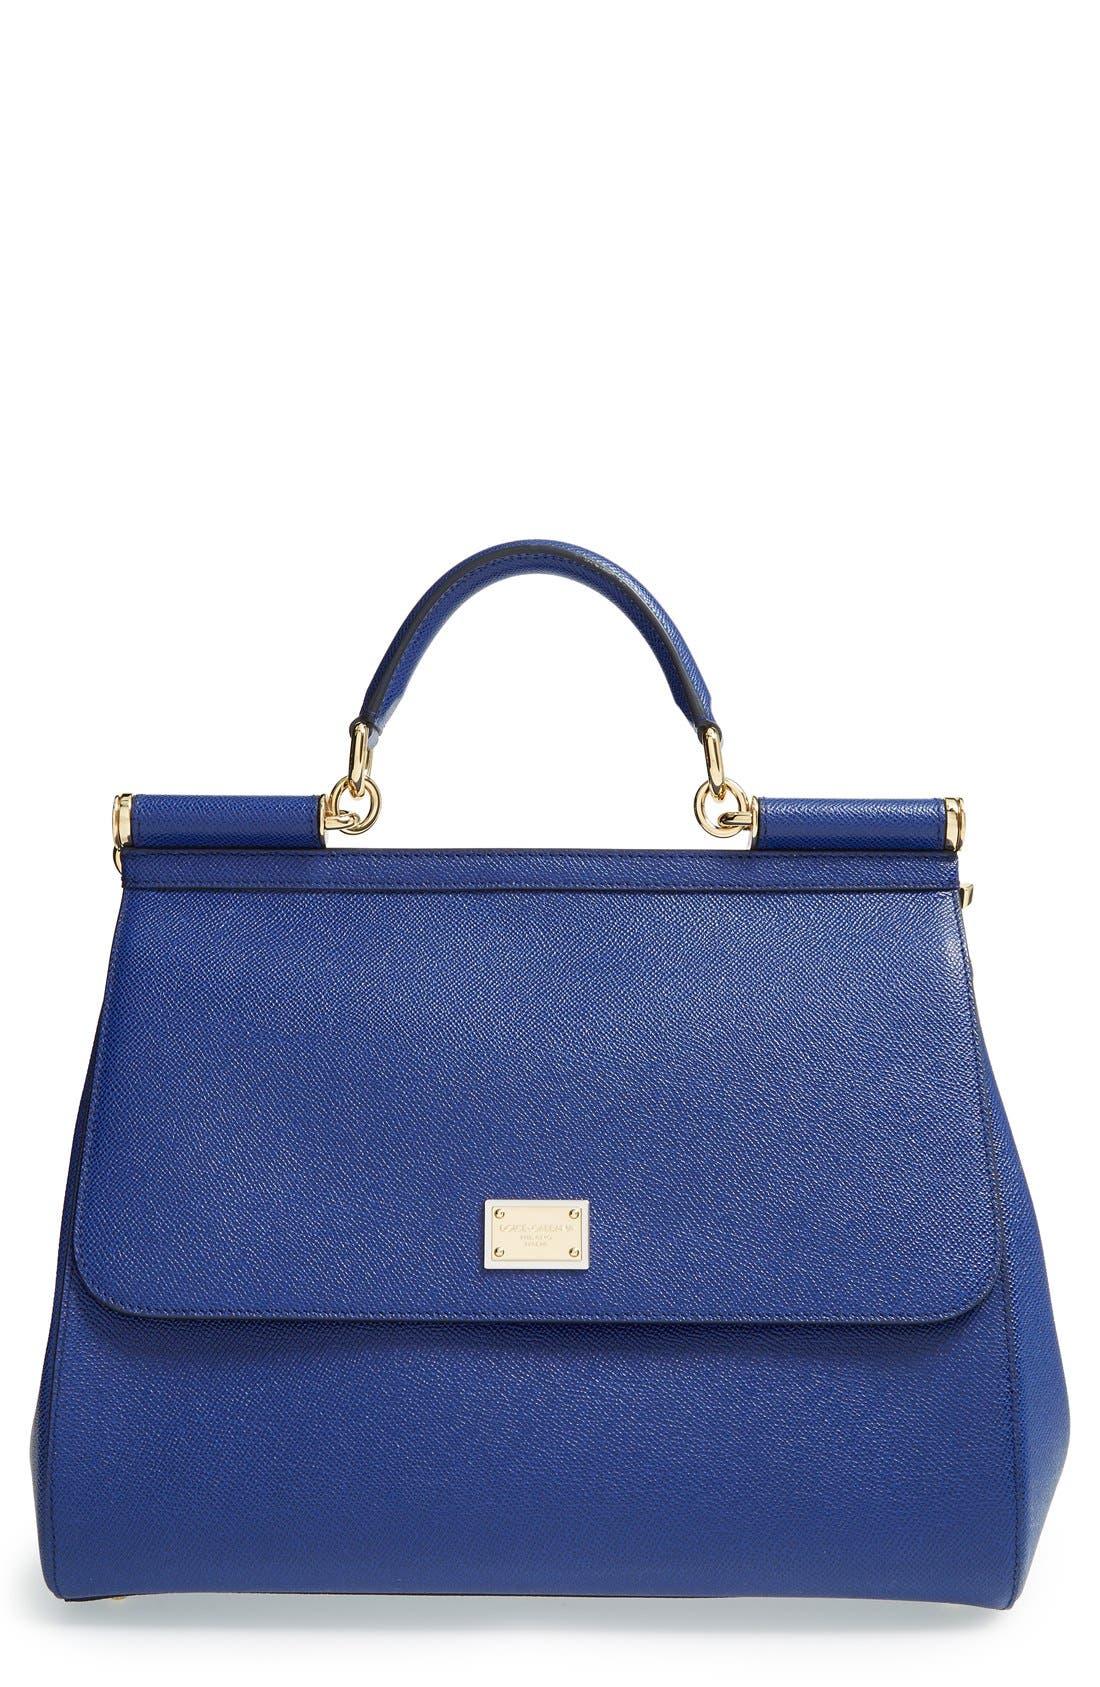 'Miss Sicily' Satchel,                         Main,                         color, Blu China